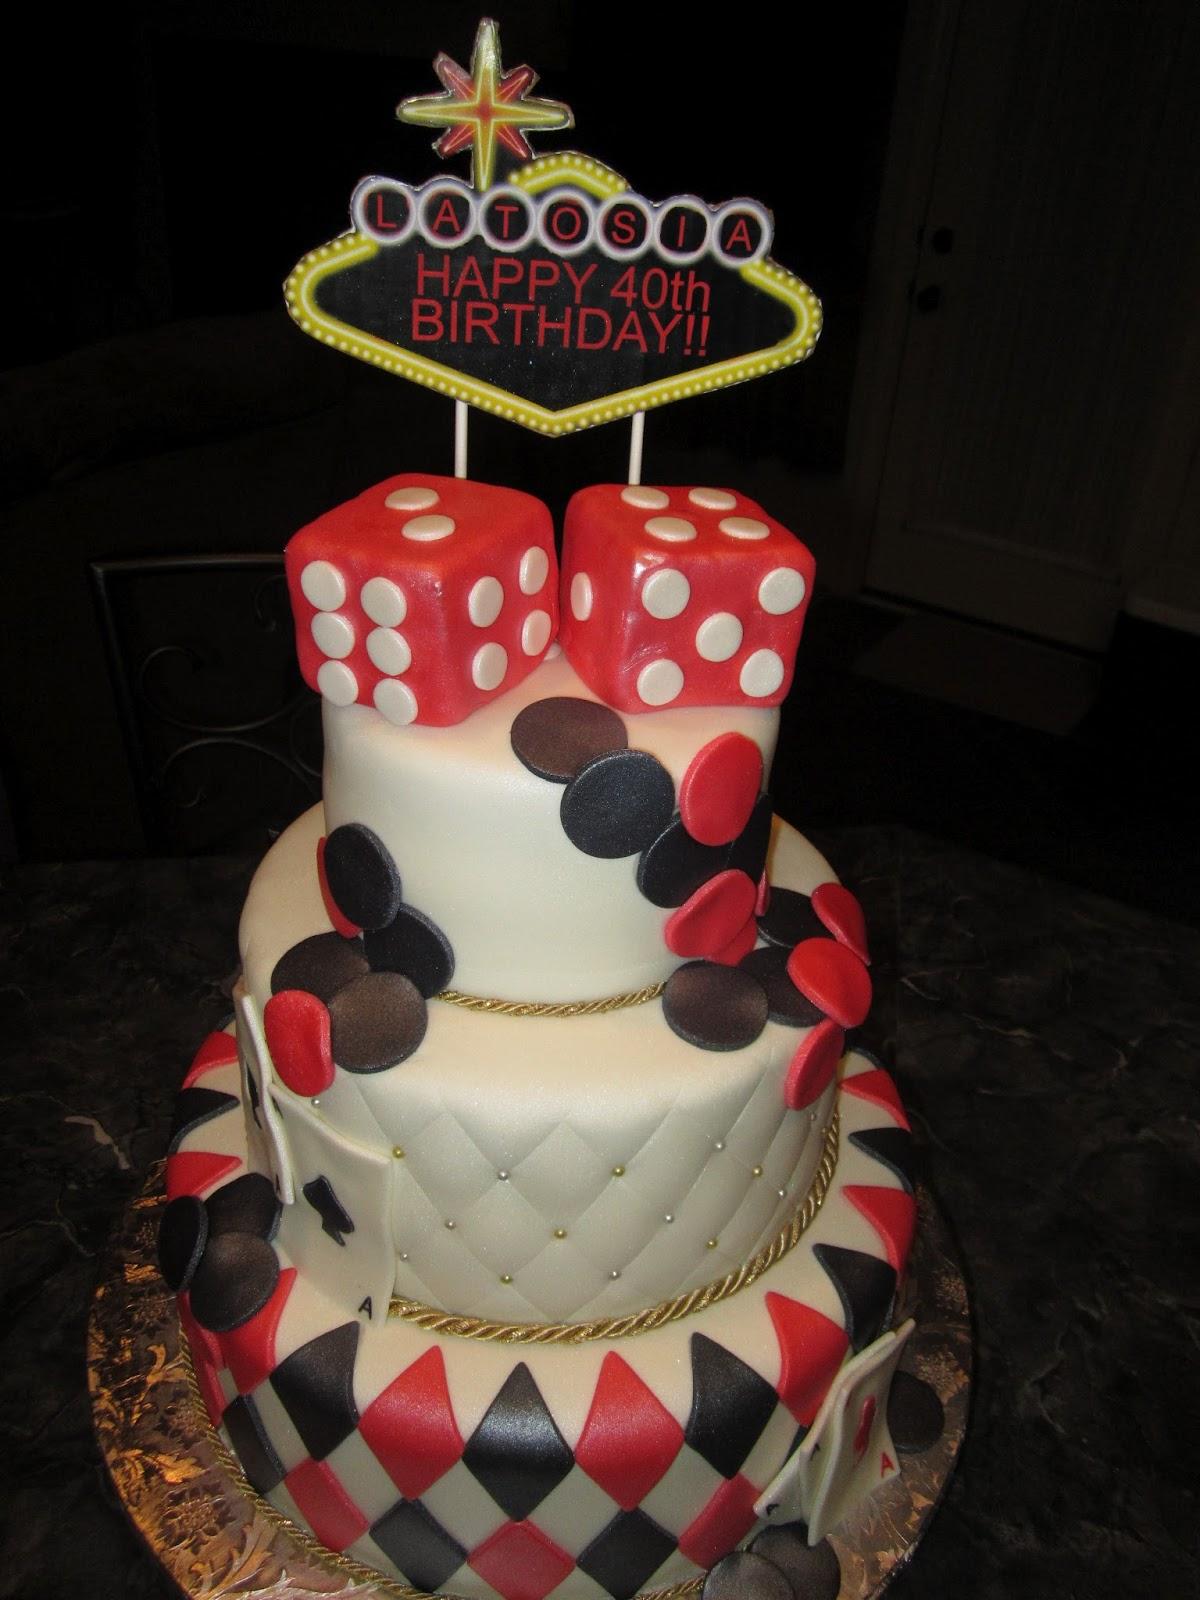 Vegas themed cakes